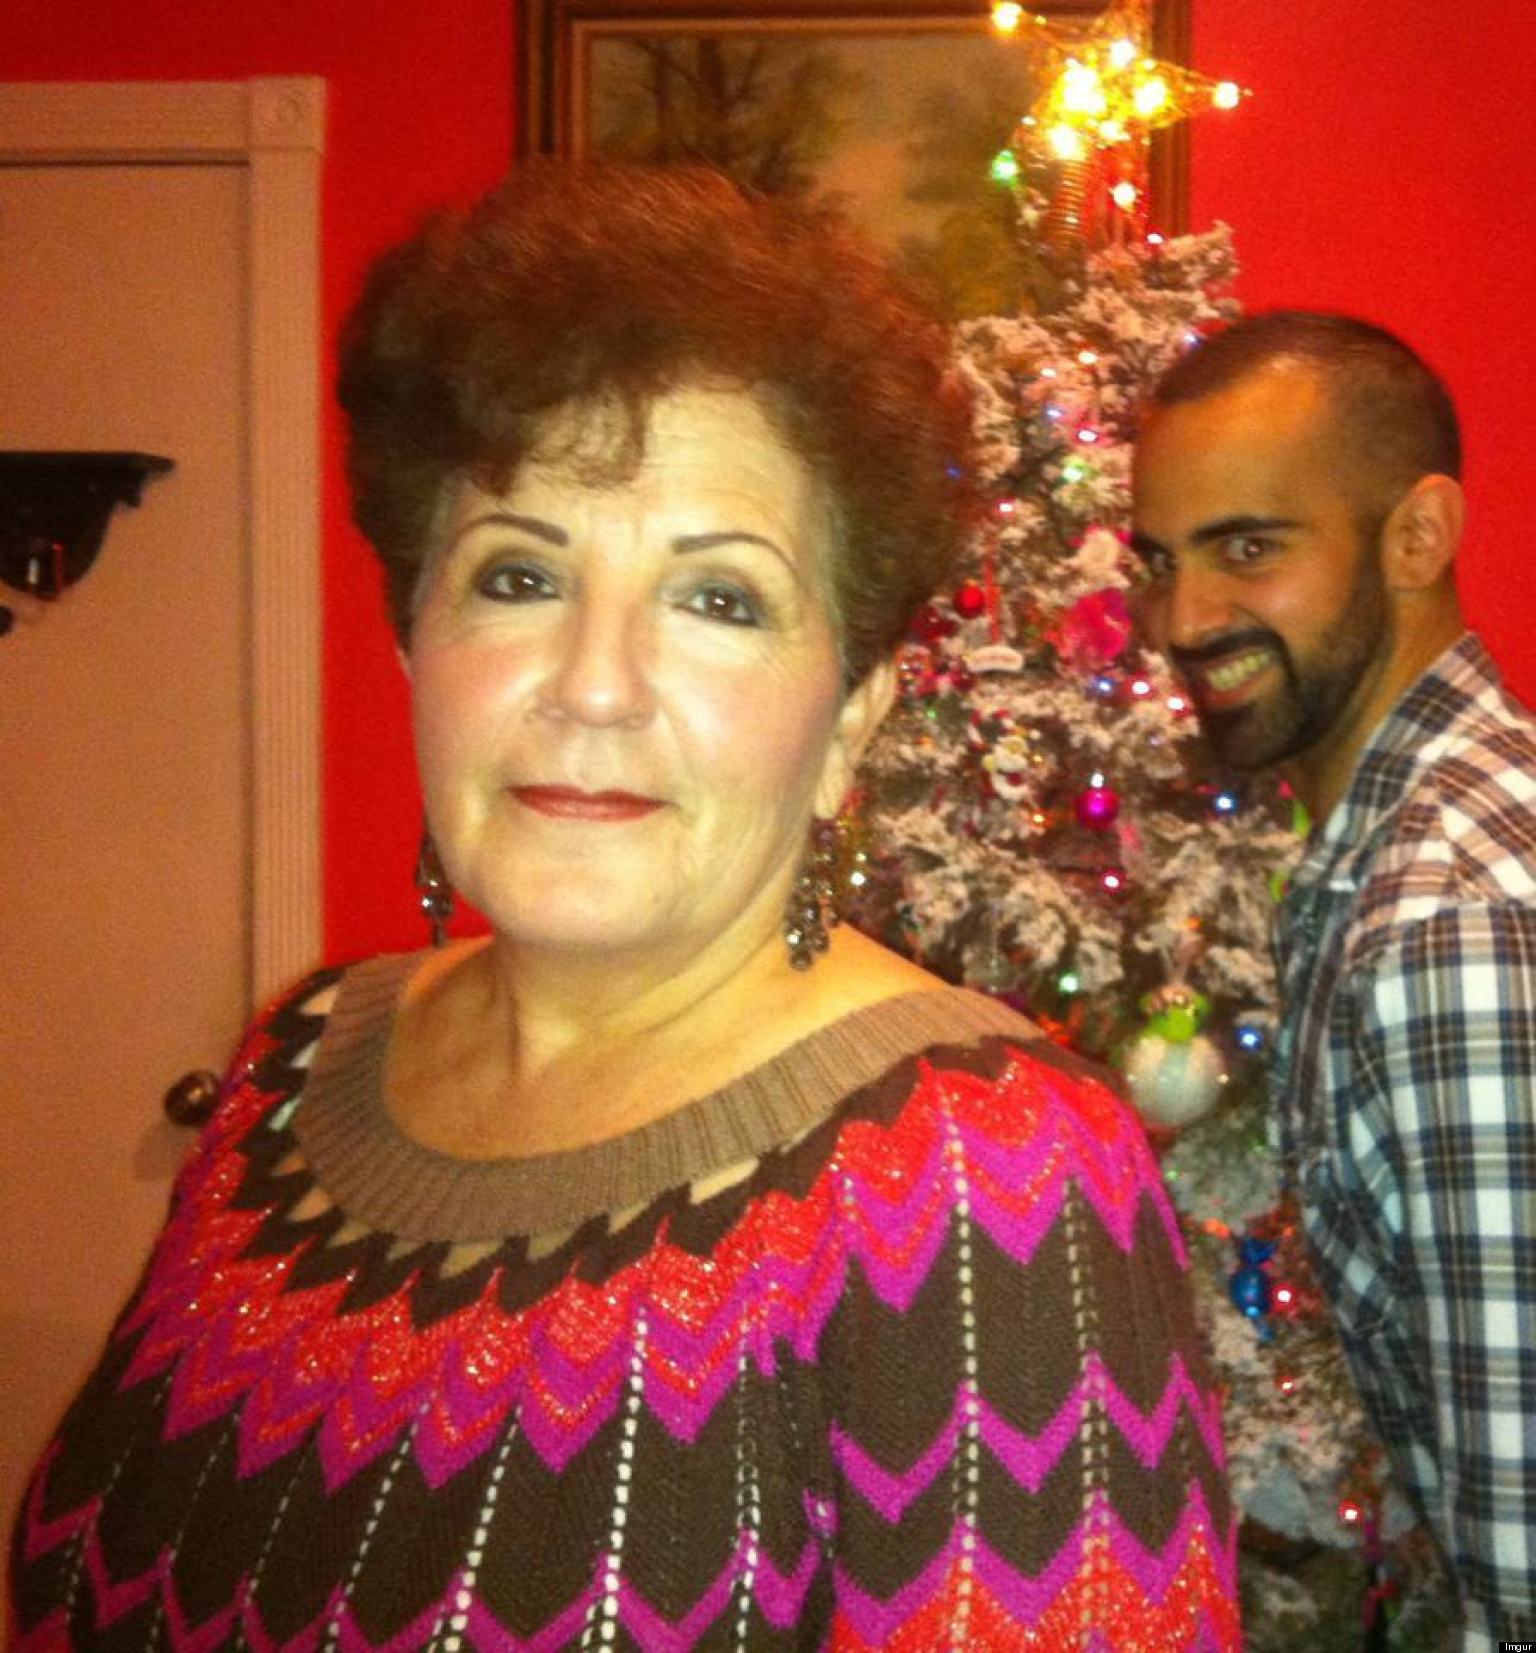 25 LOL-Worthy Holiday Photobombs